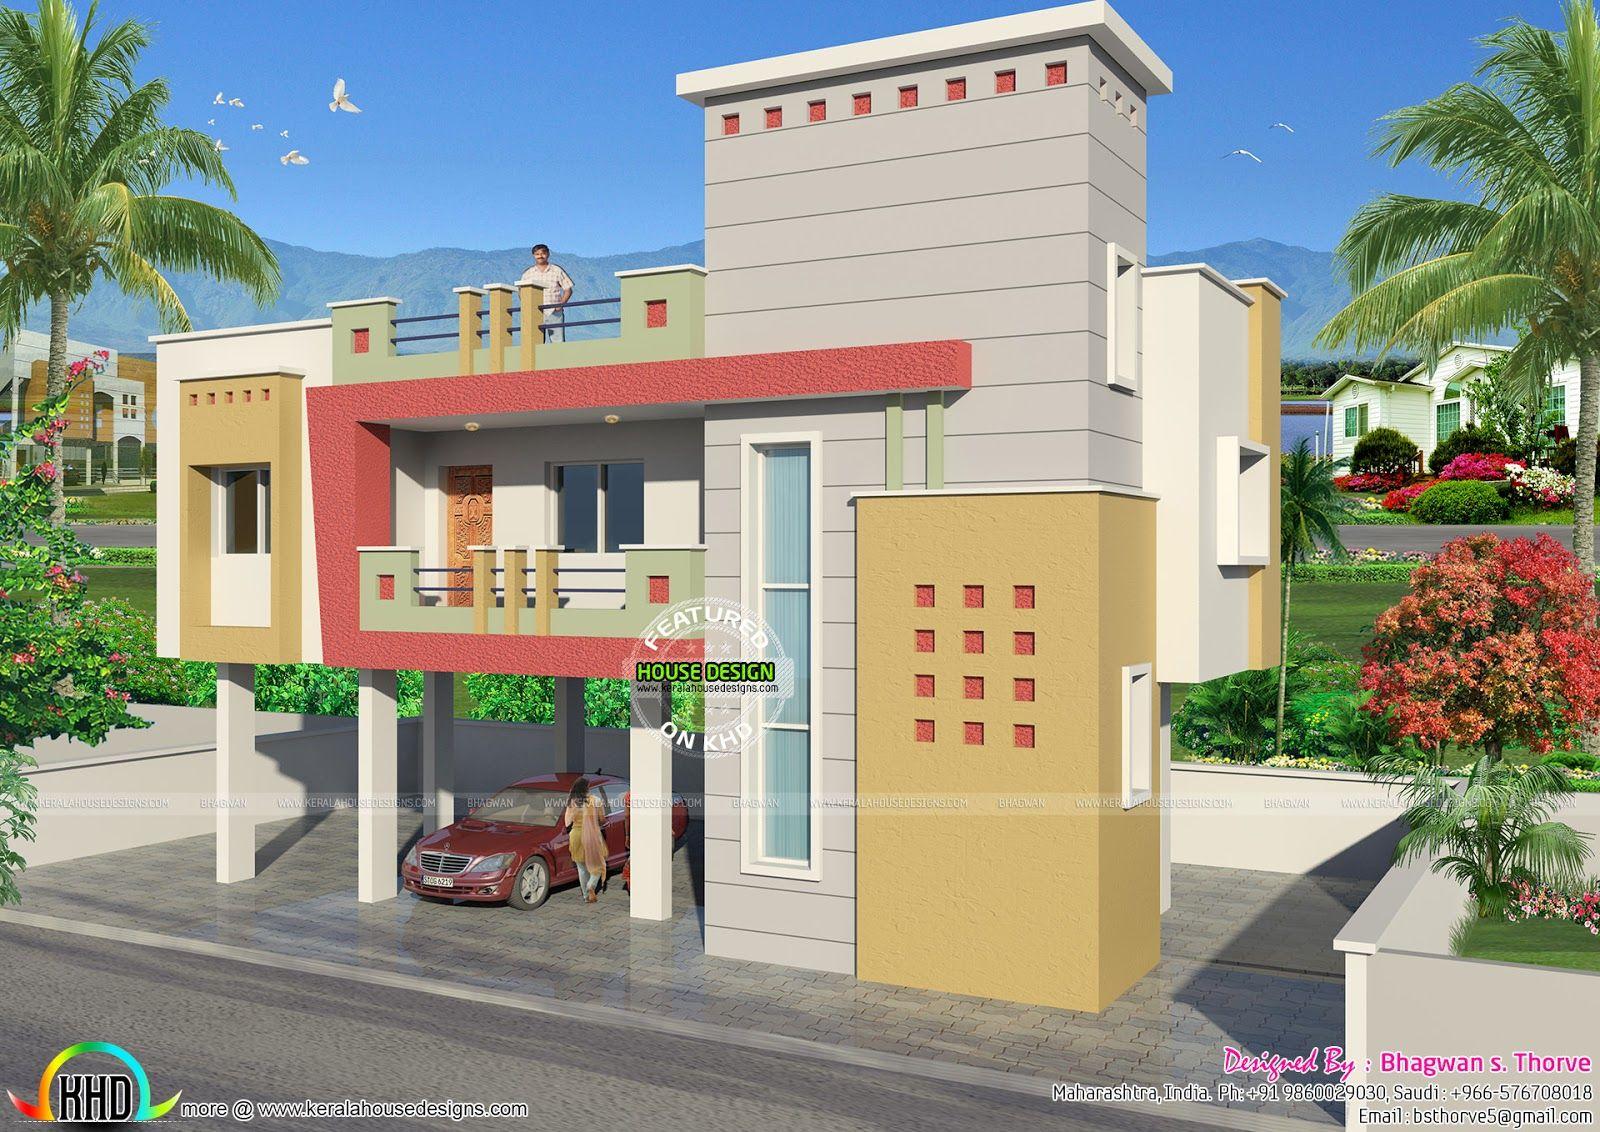 885 Sq Ft India House Design House Design Kerala House Design House On Stilts